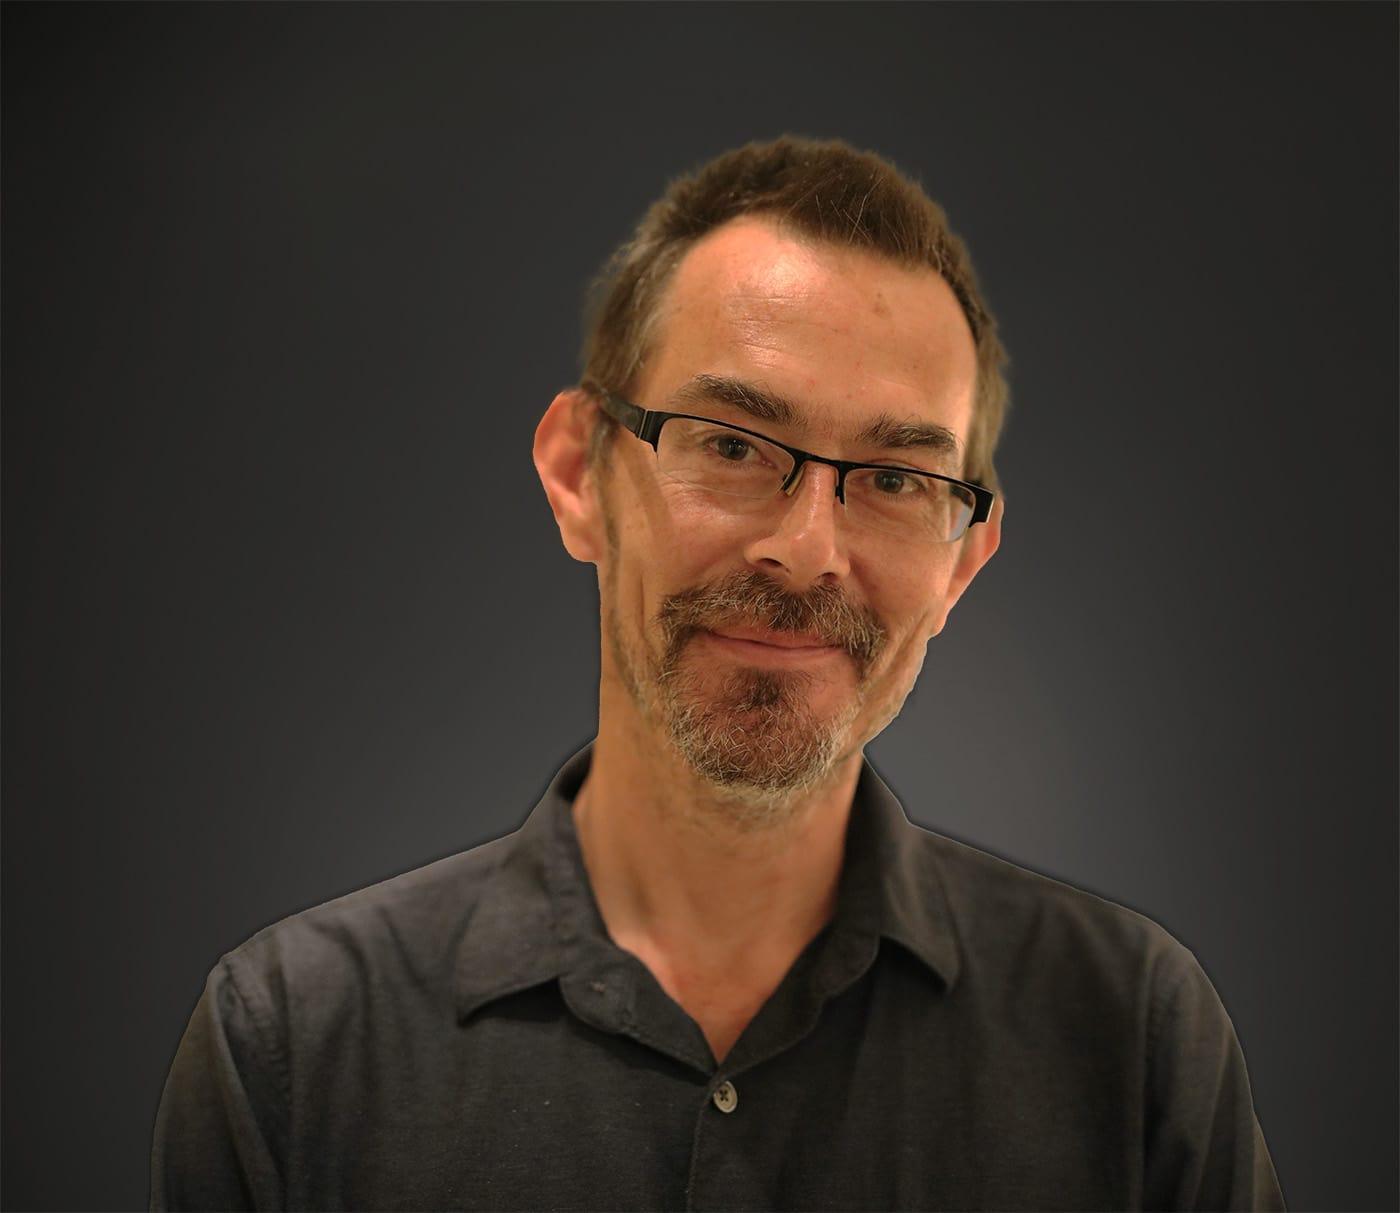 Patrick Cadenhead